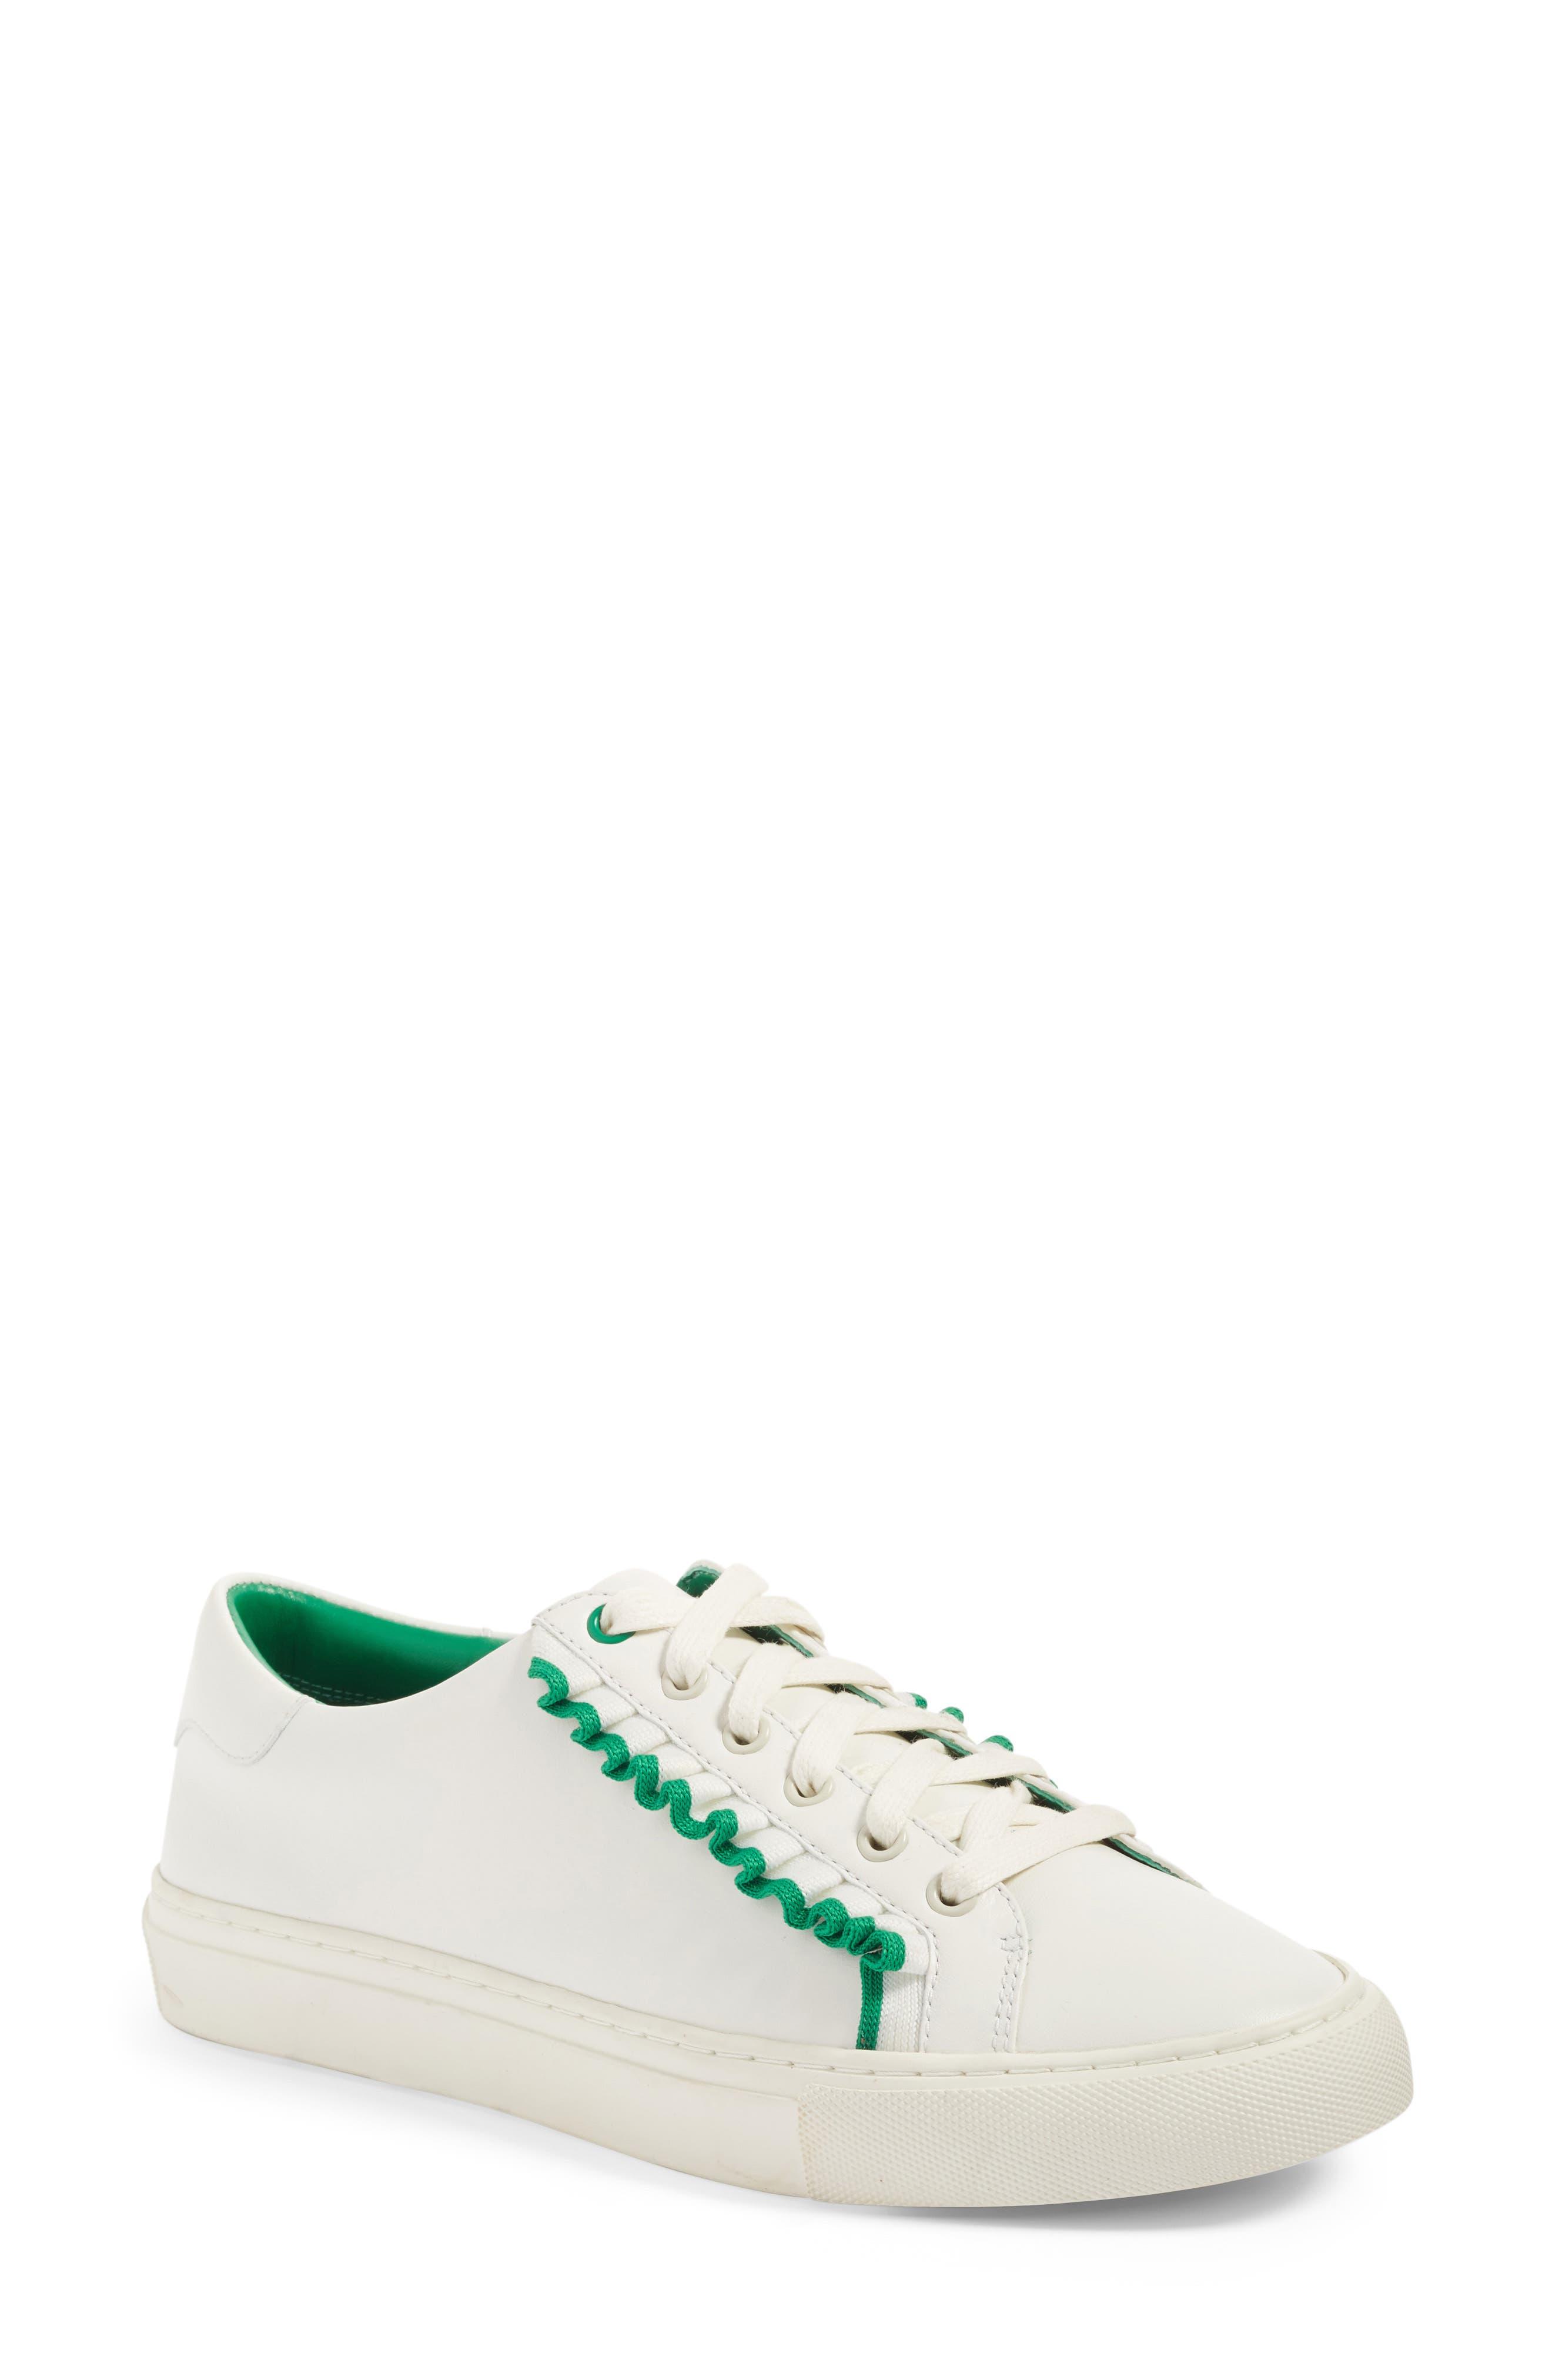 Alternate Image 1 Selected - Tory Sport Ruffle Sneaker (Women)